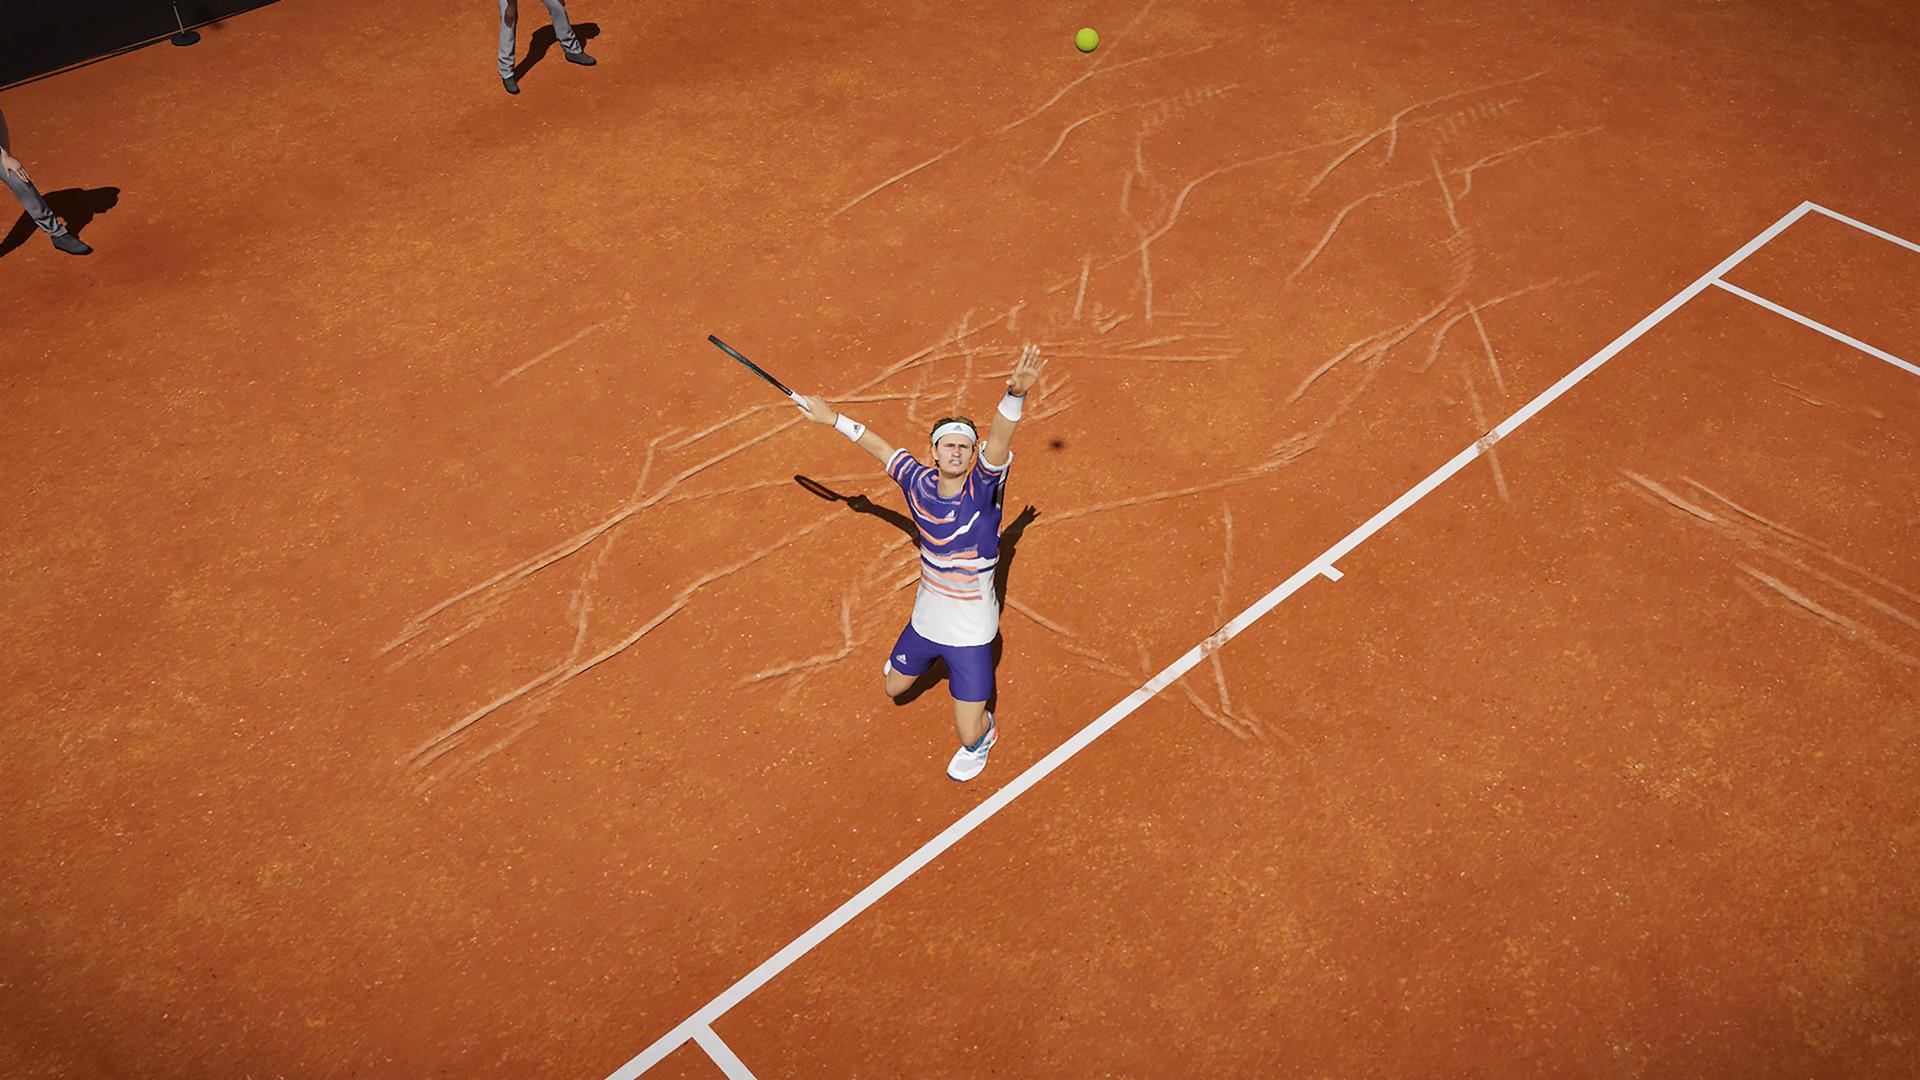 tennis-world-tour-2-pc-screenshot-04